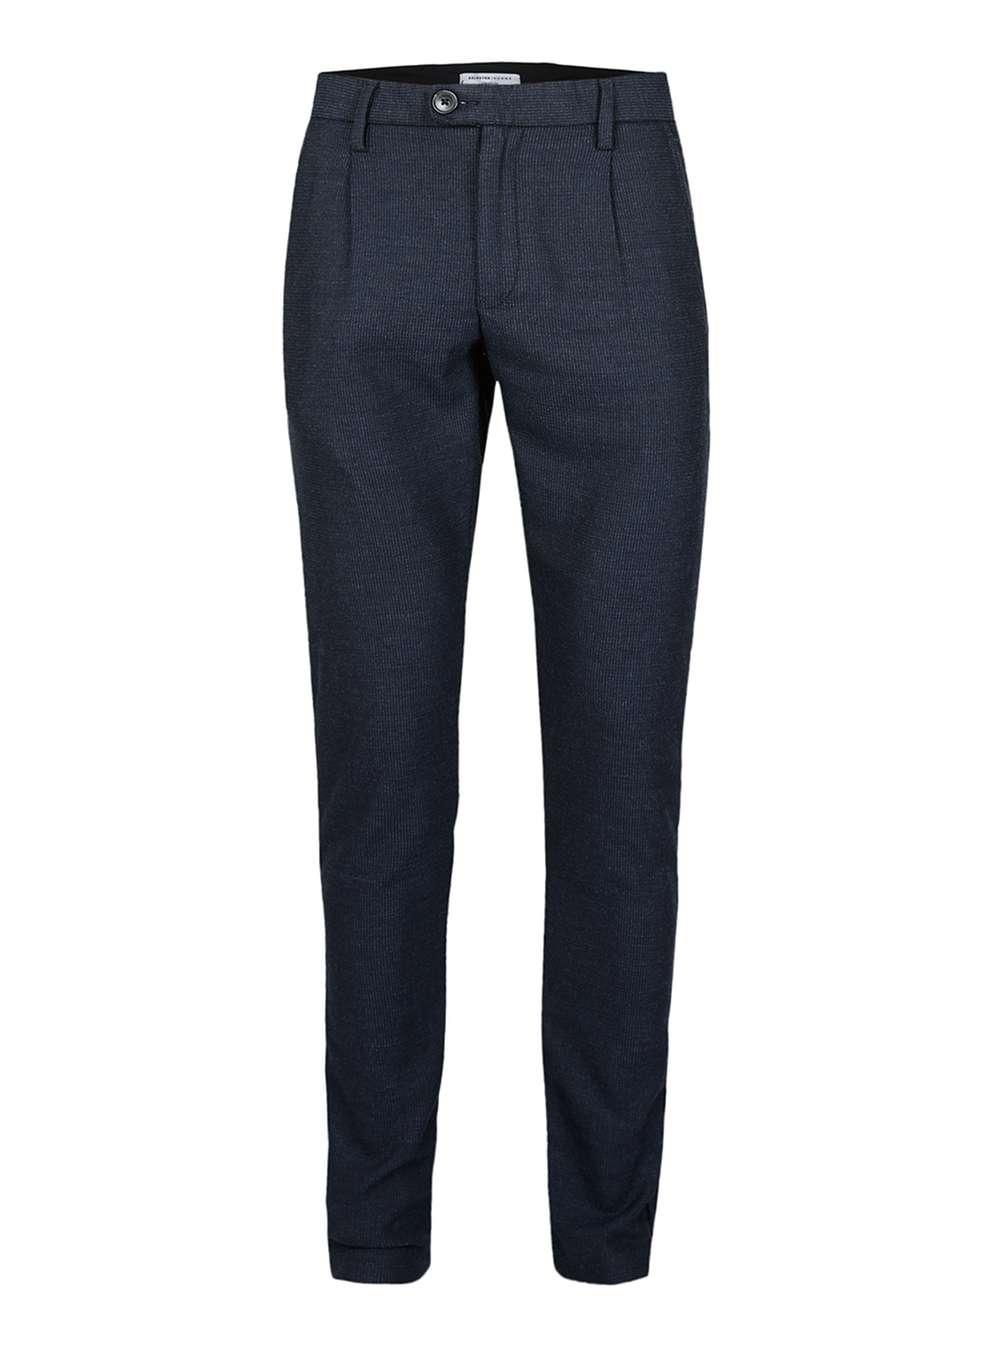 Navy Textured Dress Pants